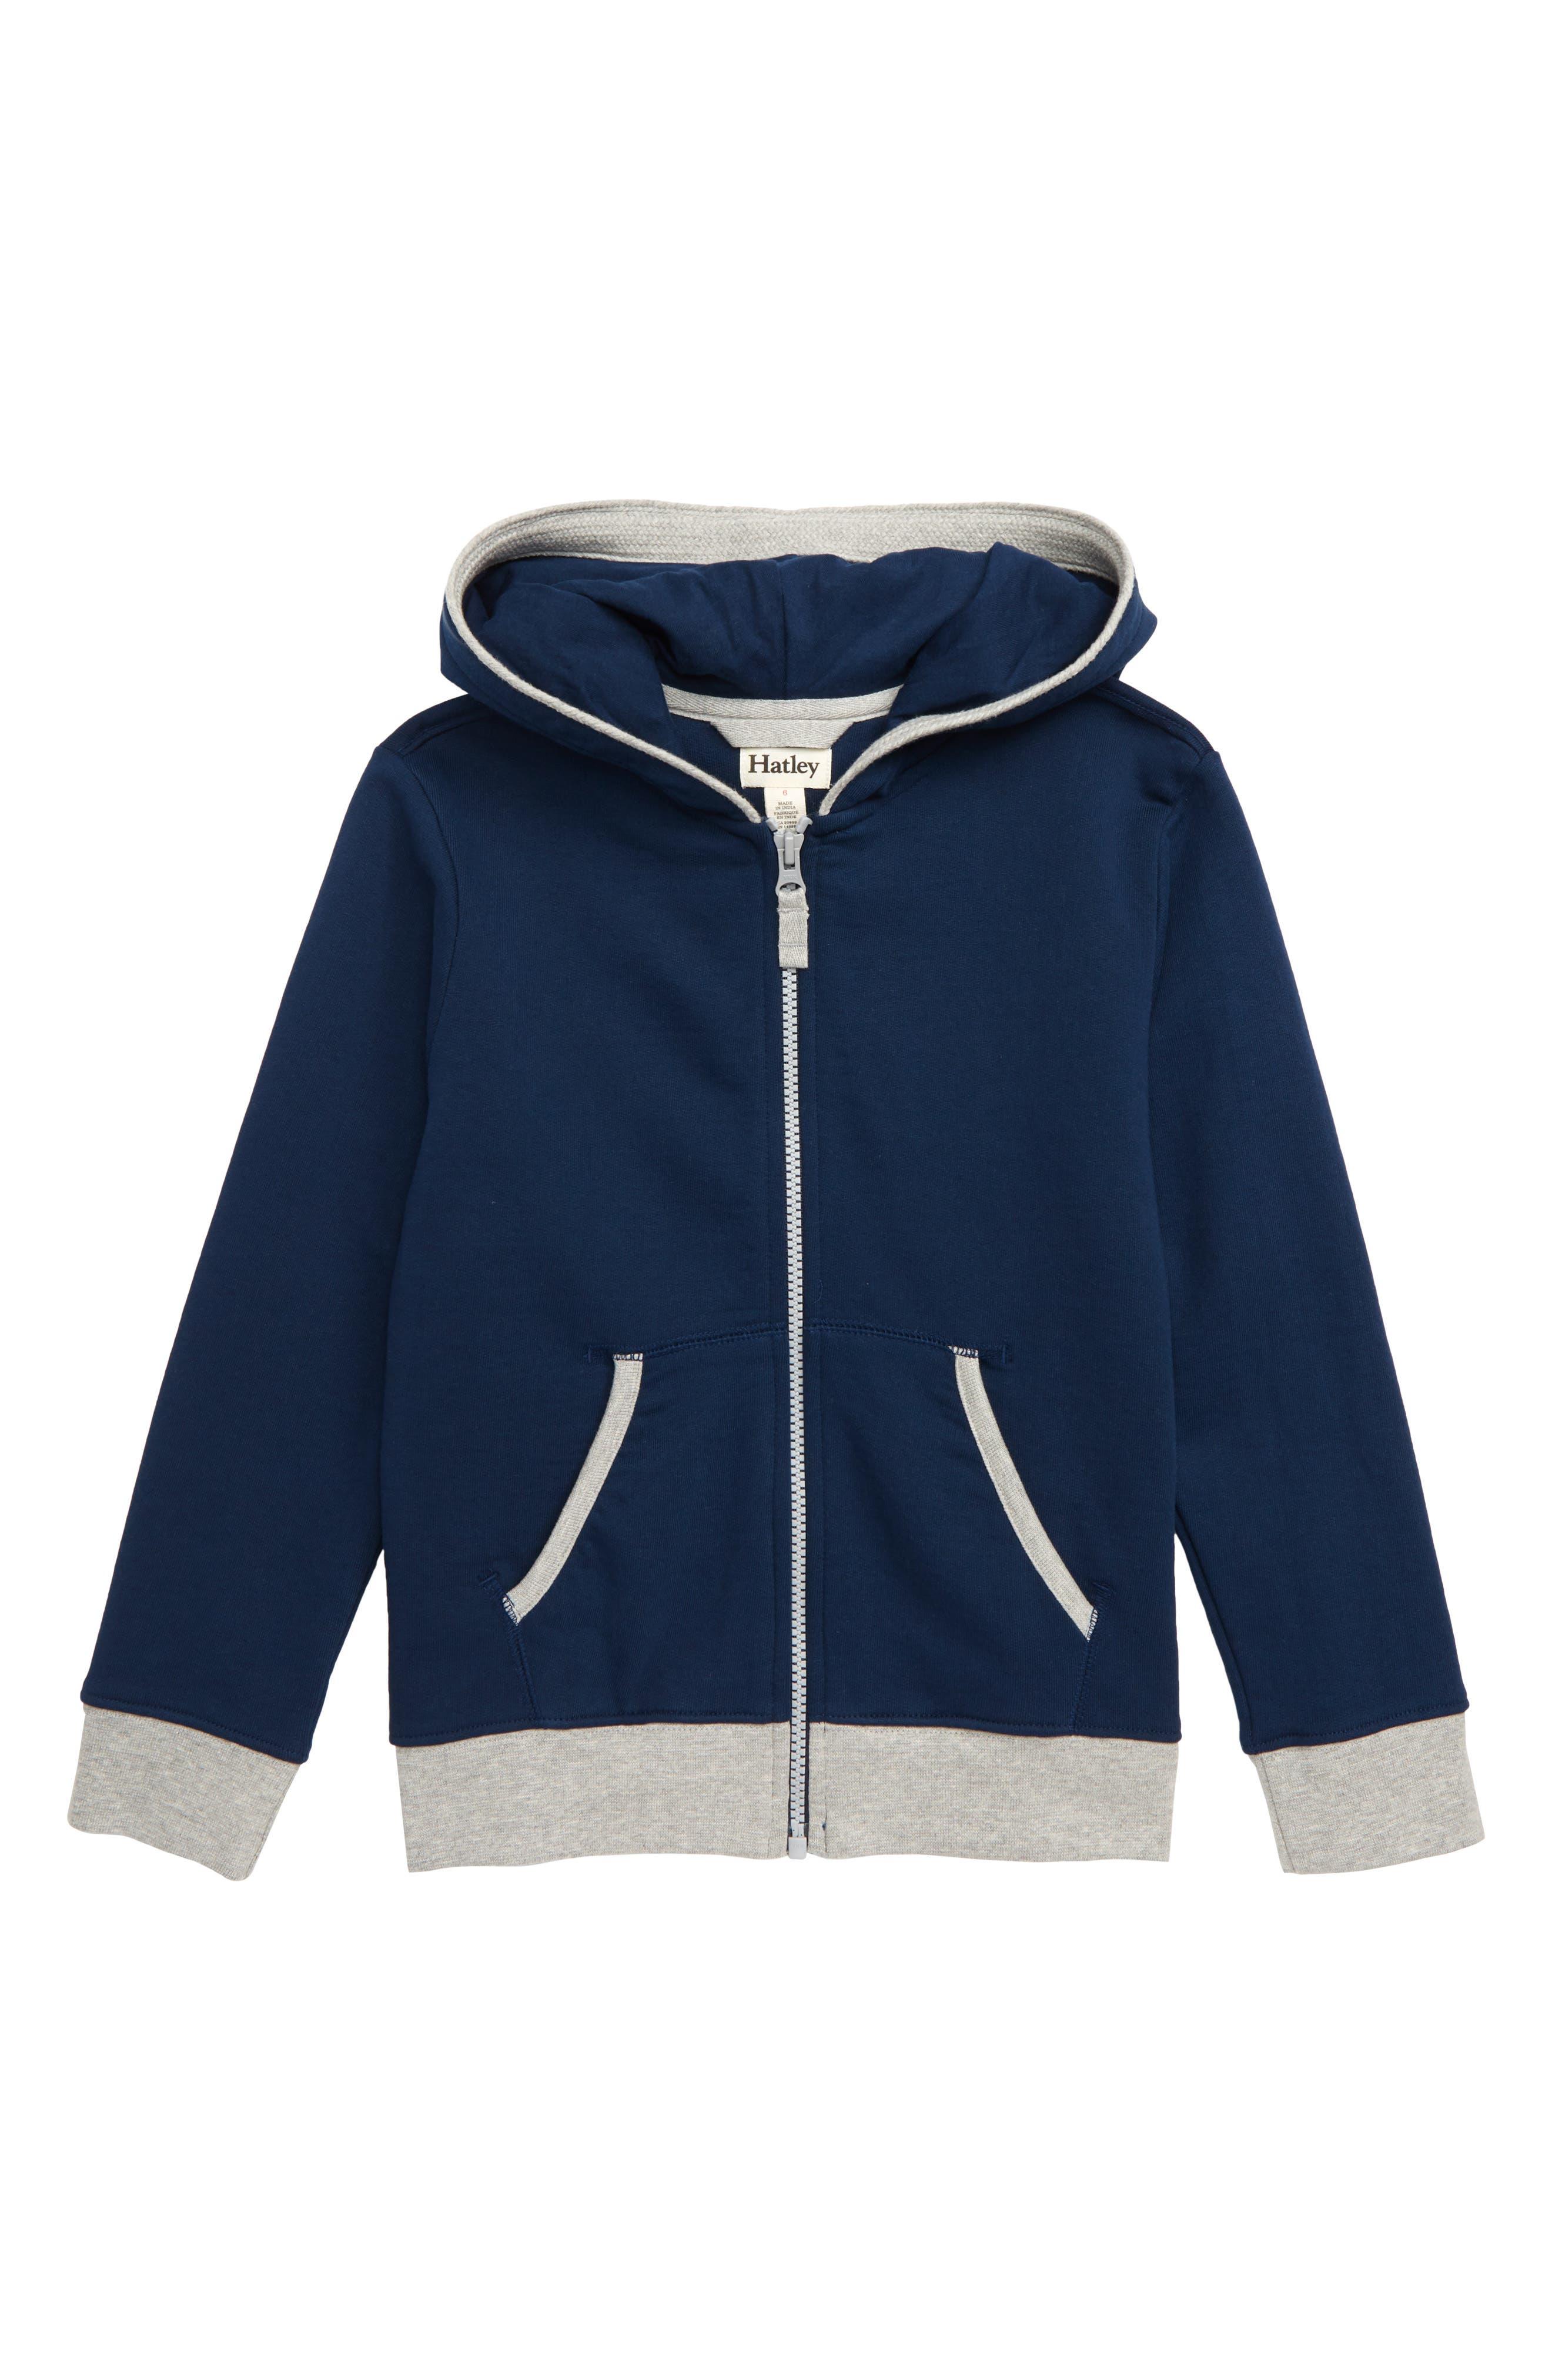 Boys Hatley Front Zip Hoodie Size 7  Blue